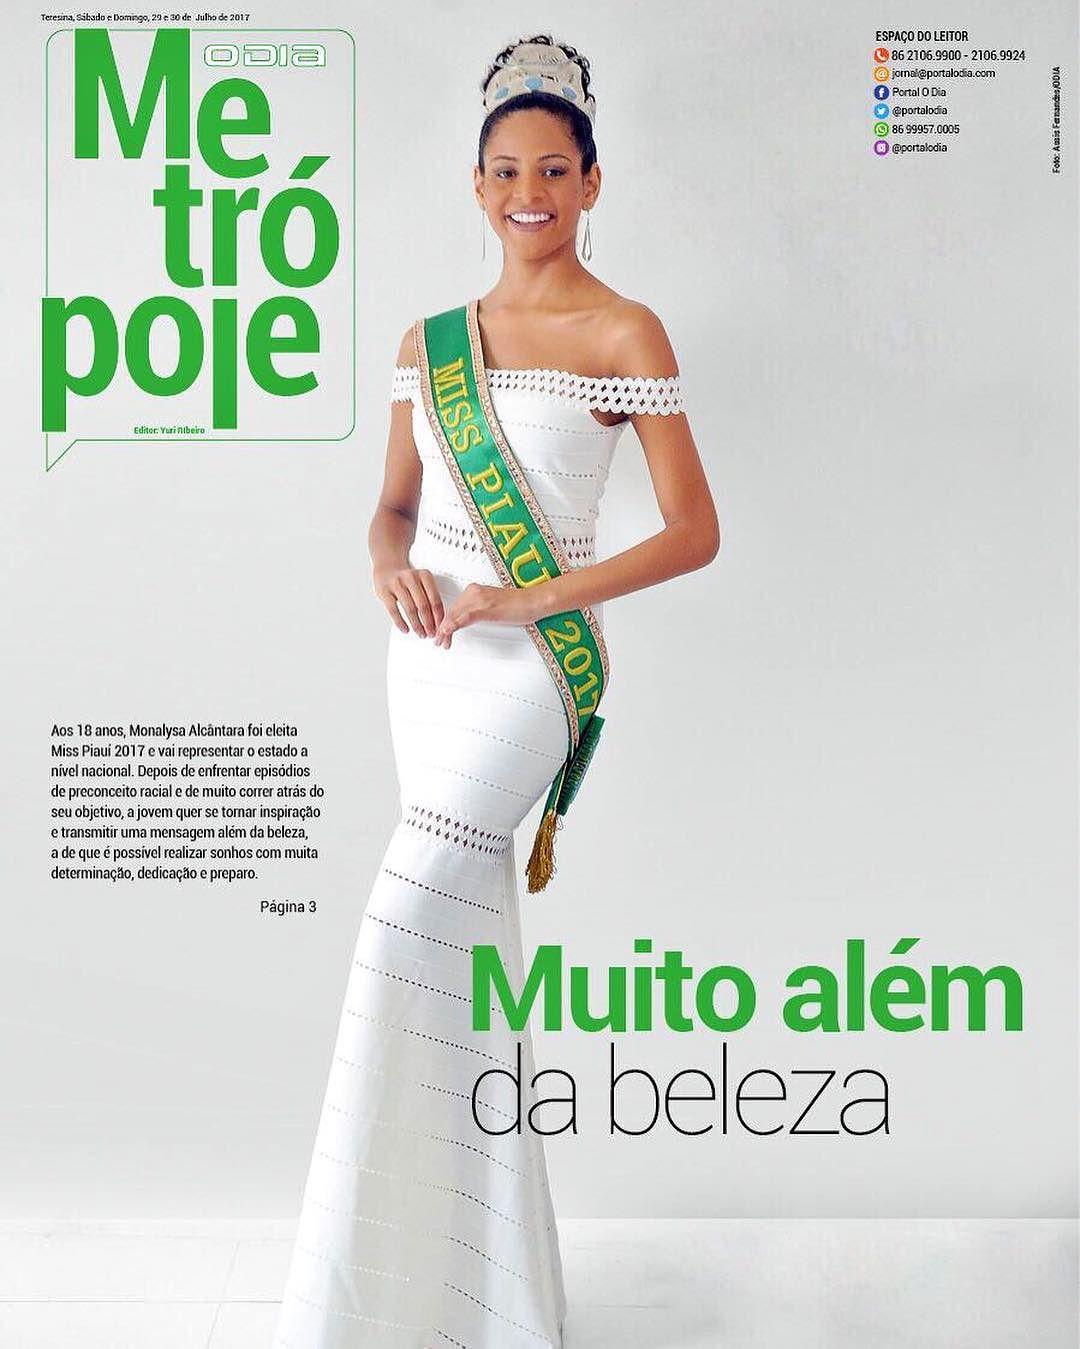 monalysa alcantara, top 10 de miss universo 2017. - Página 2 20481813